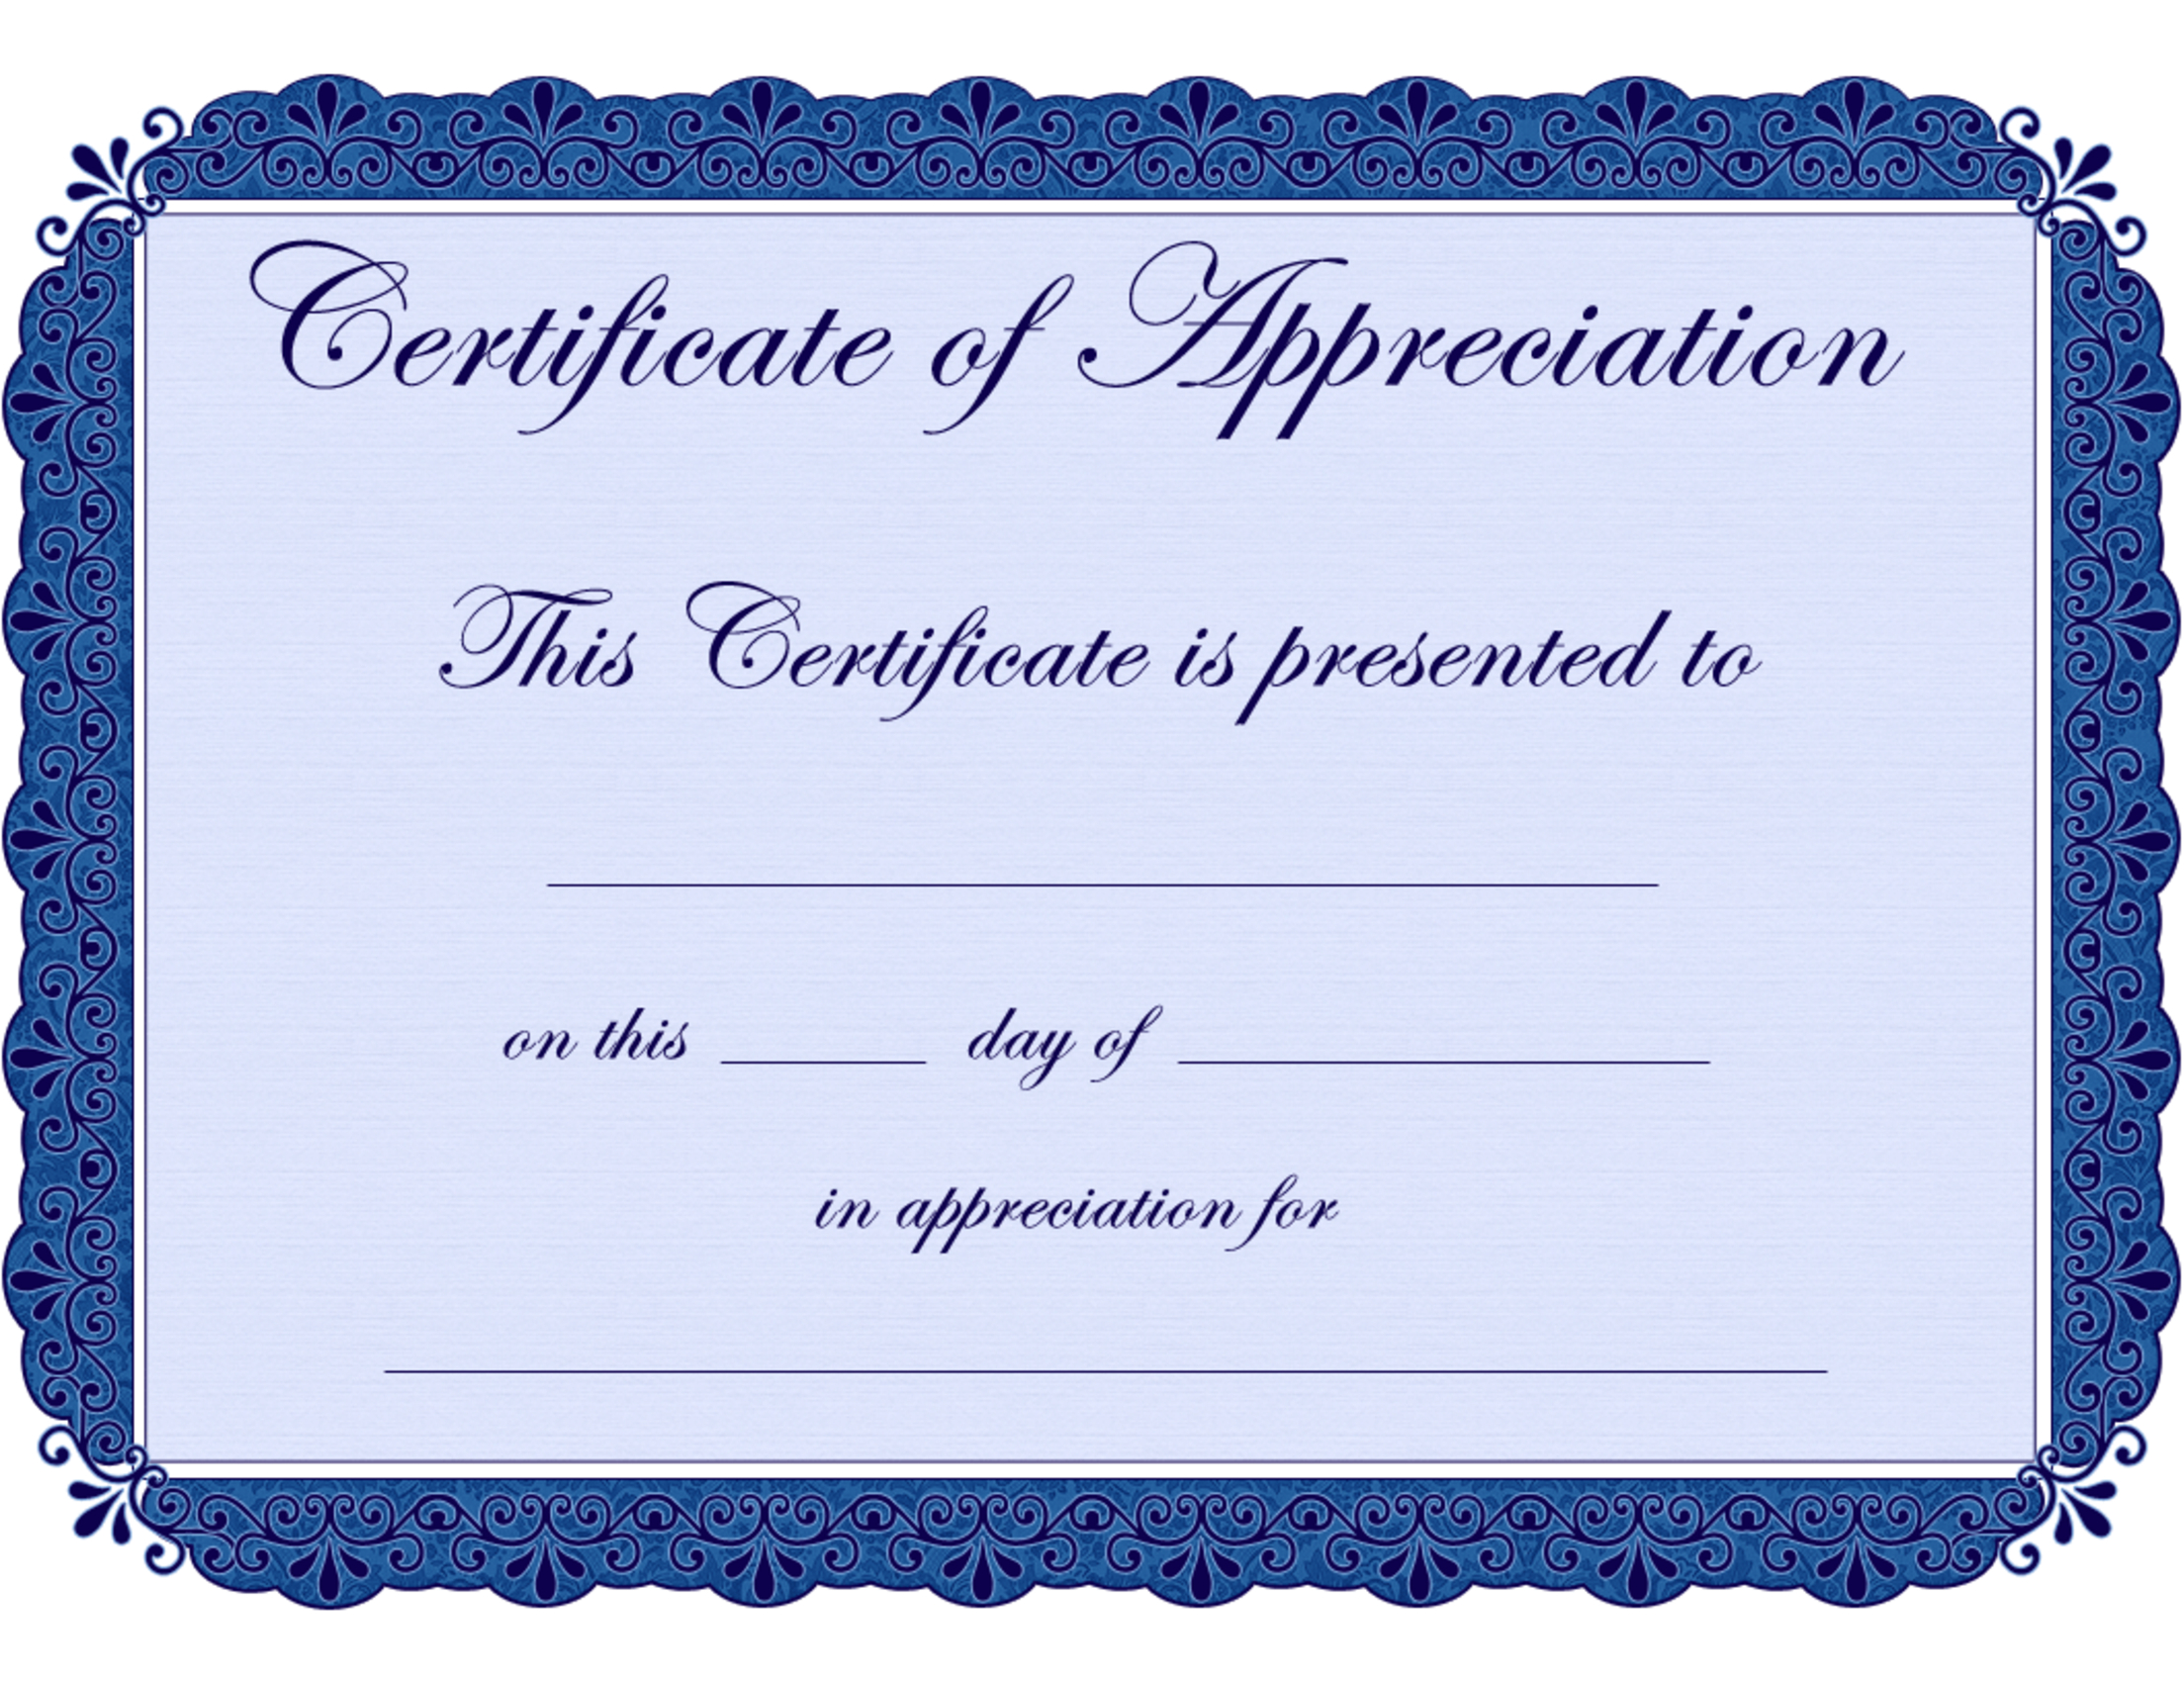 Free Printable Certificates Certificate Of Appreciation Certificate - Free Printable Volunteer Certificates Of Appreciation